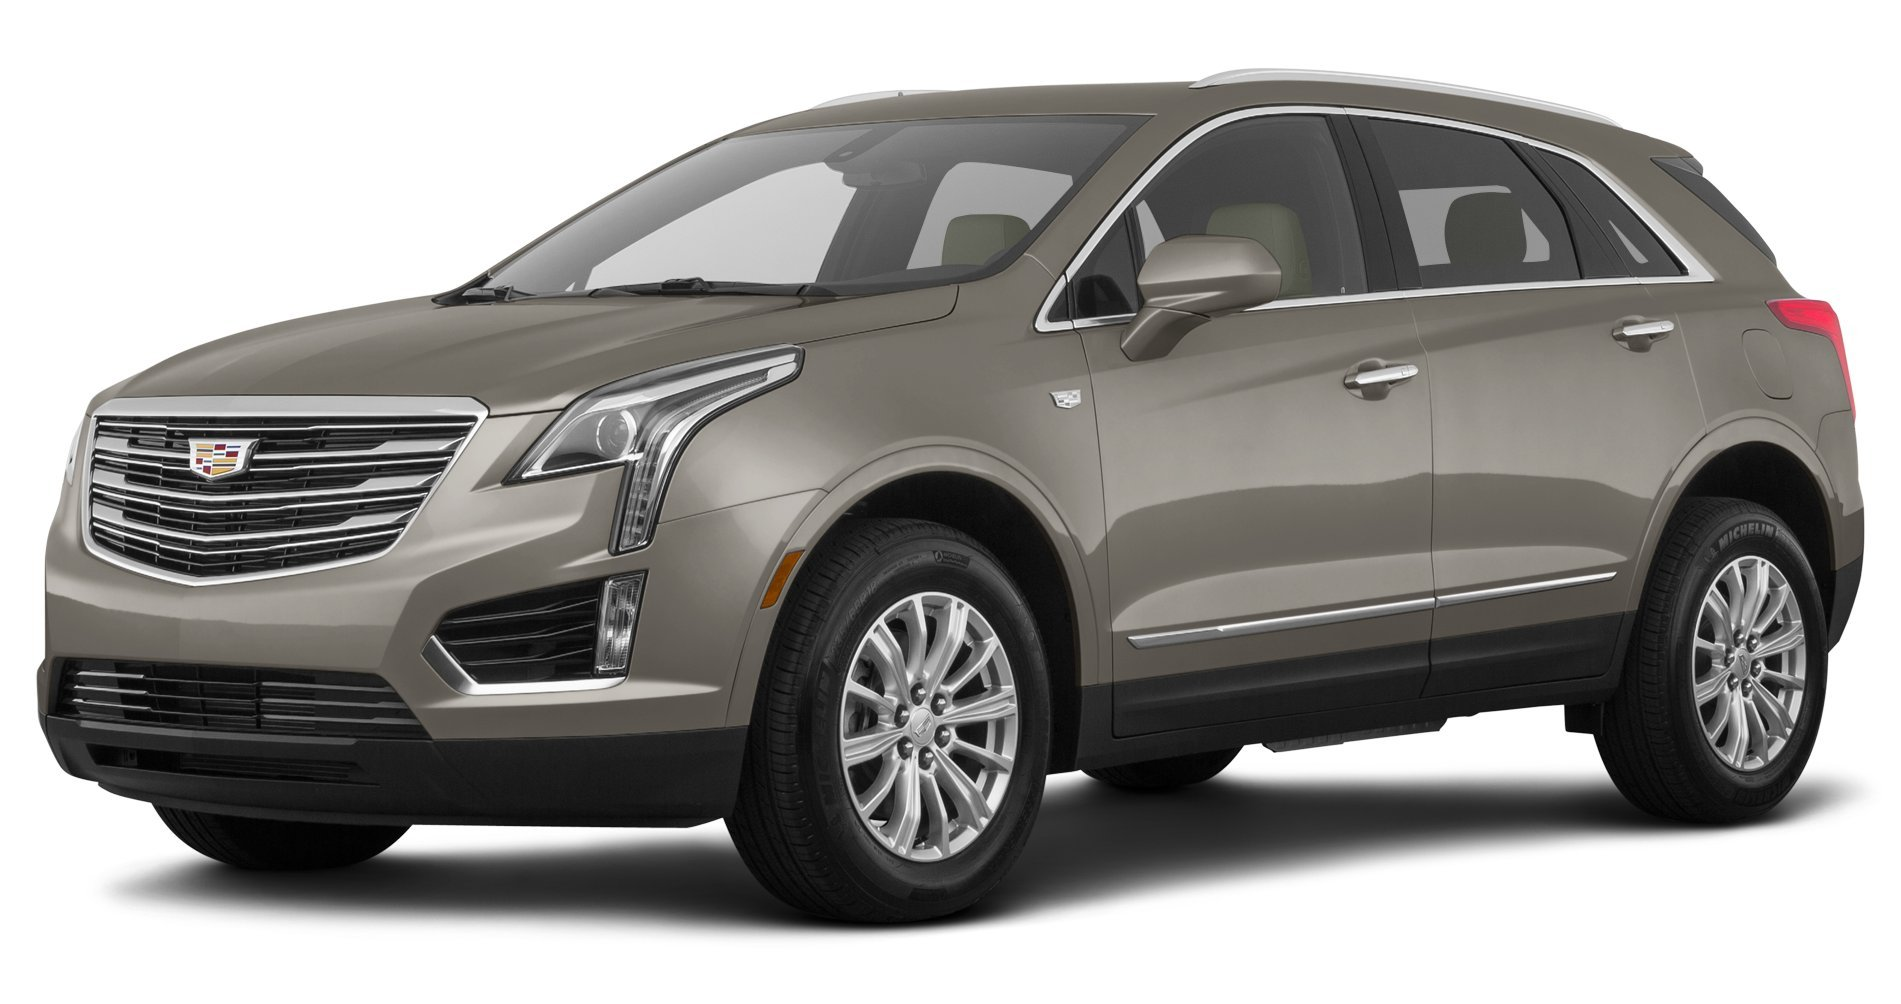 2018 cadillac sports car.  sports 2018 cadillac xt5 all wheel drive 4door  throughout cadillac sports car